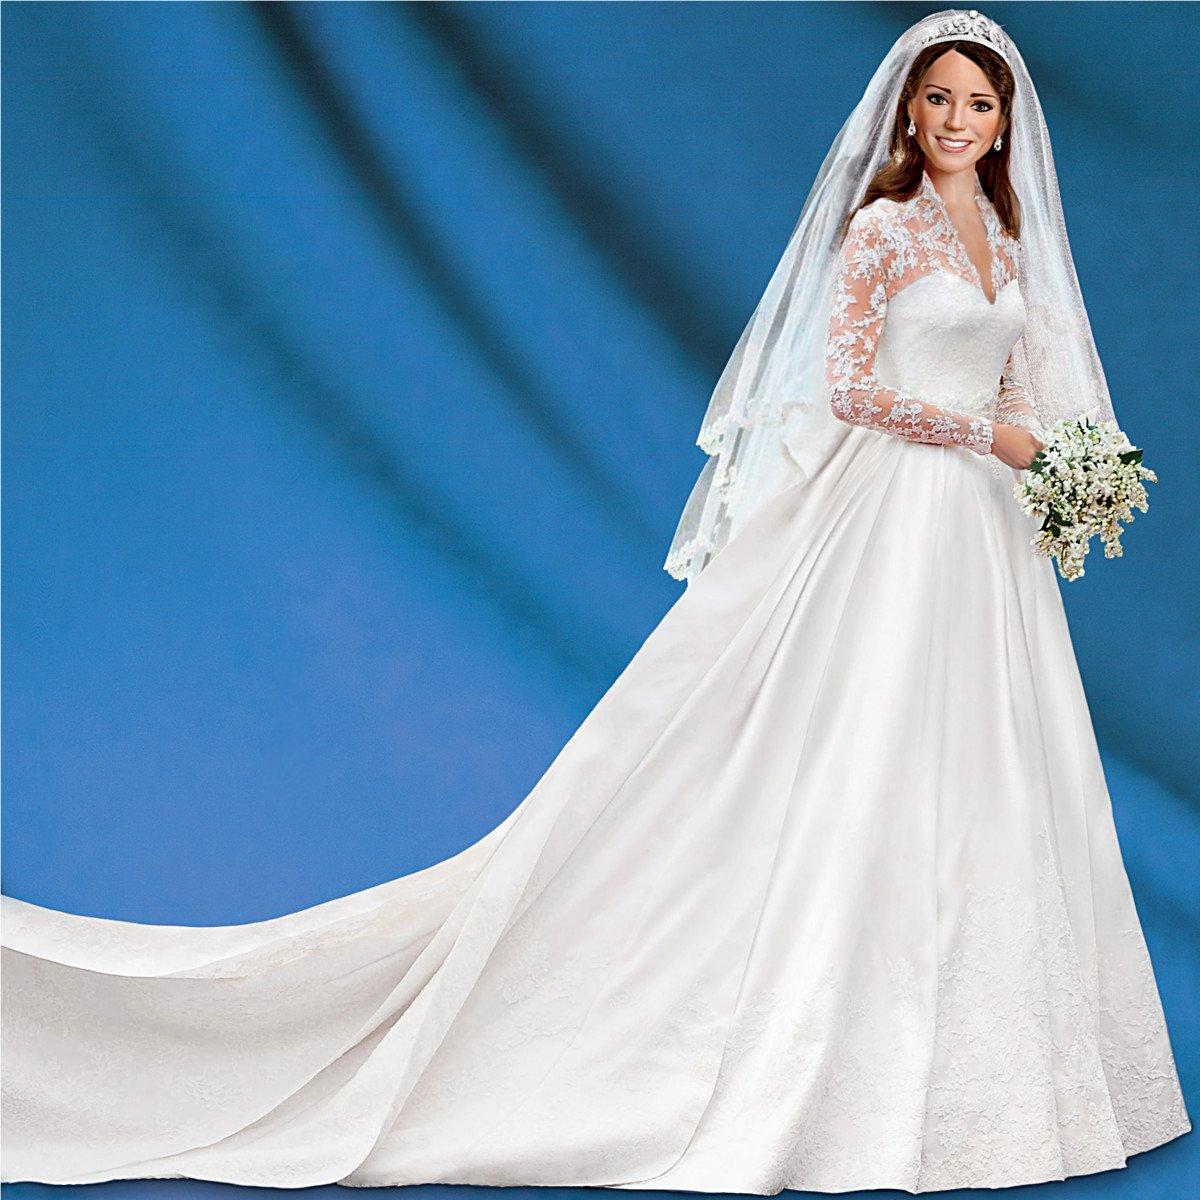 Amazon.com: Kate Middleton Bride Doll | Princess Catherine Wedding ...